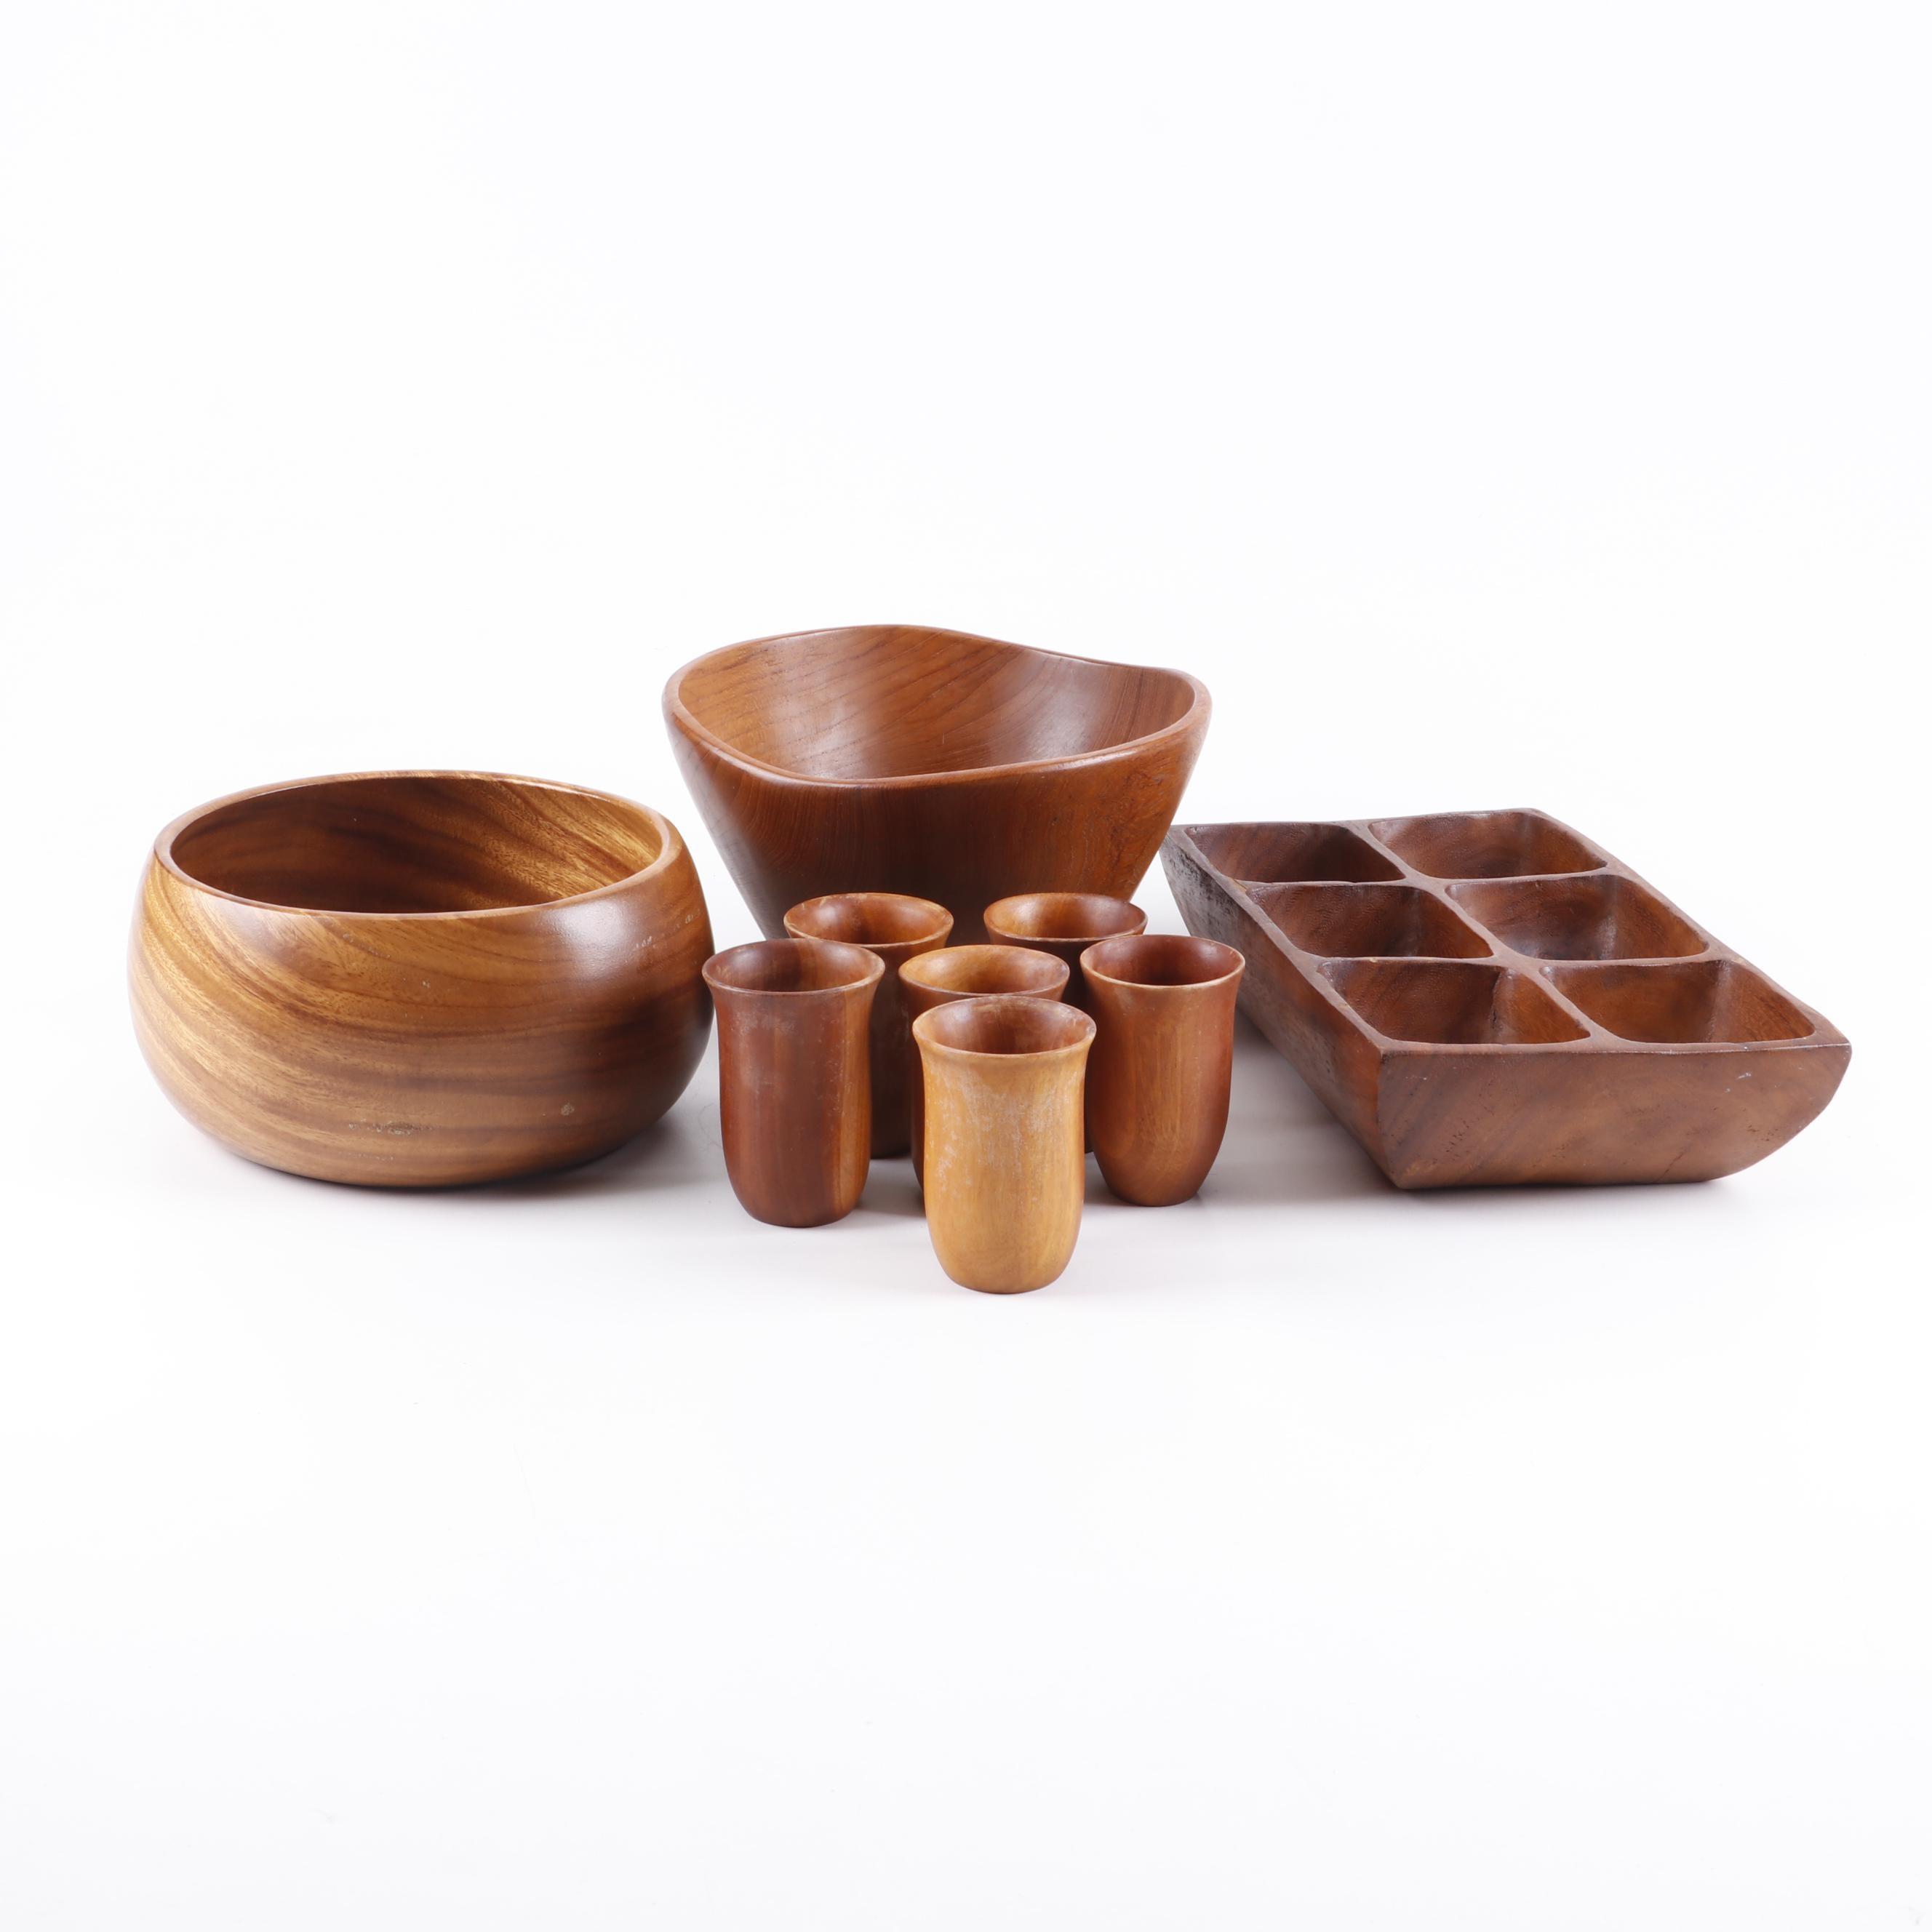 Teak Dinnerware with House of Monkeypod Wood Bowl